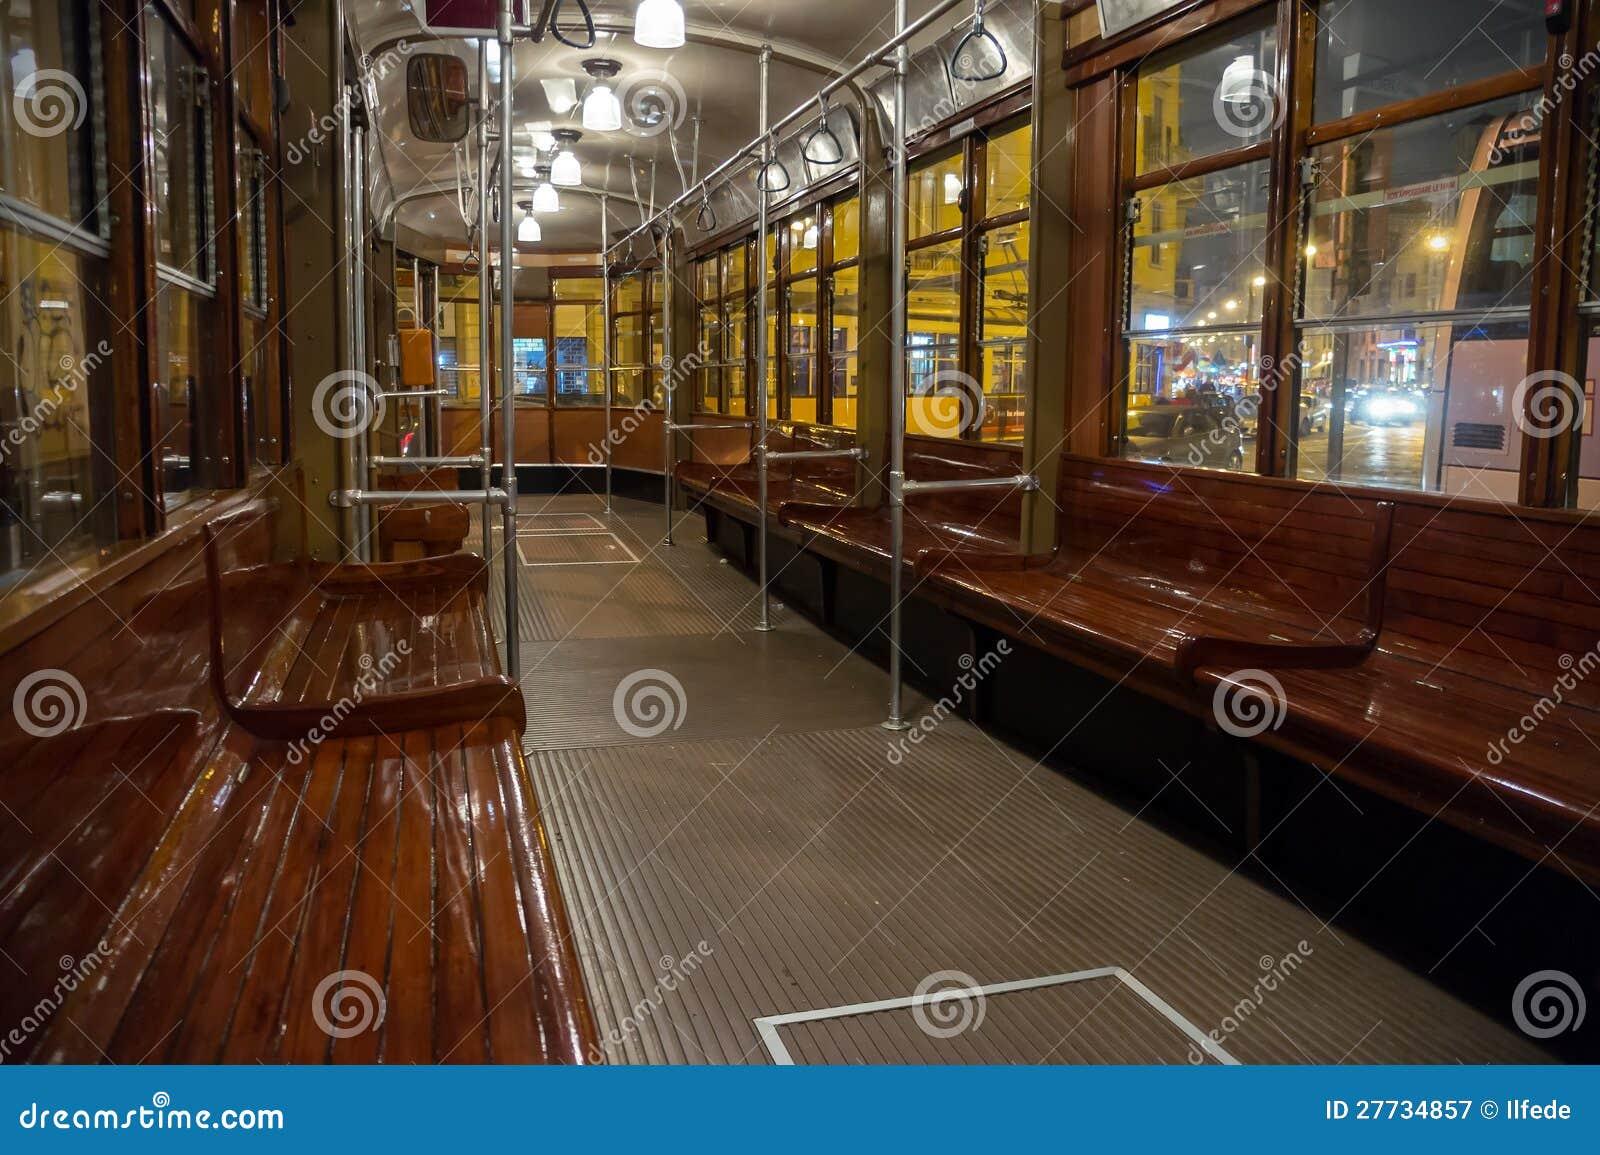 https://thumbs.dreamstime.com/z/inside-classic-tram-milan-italy-27734857.jpg